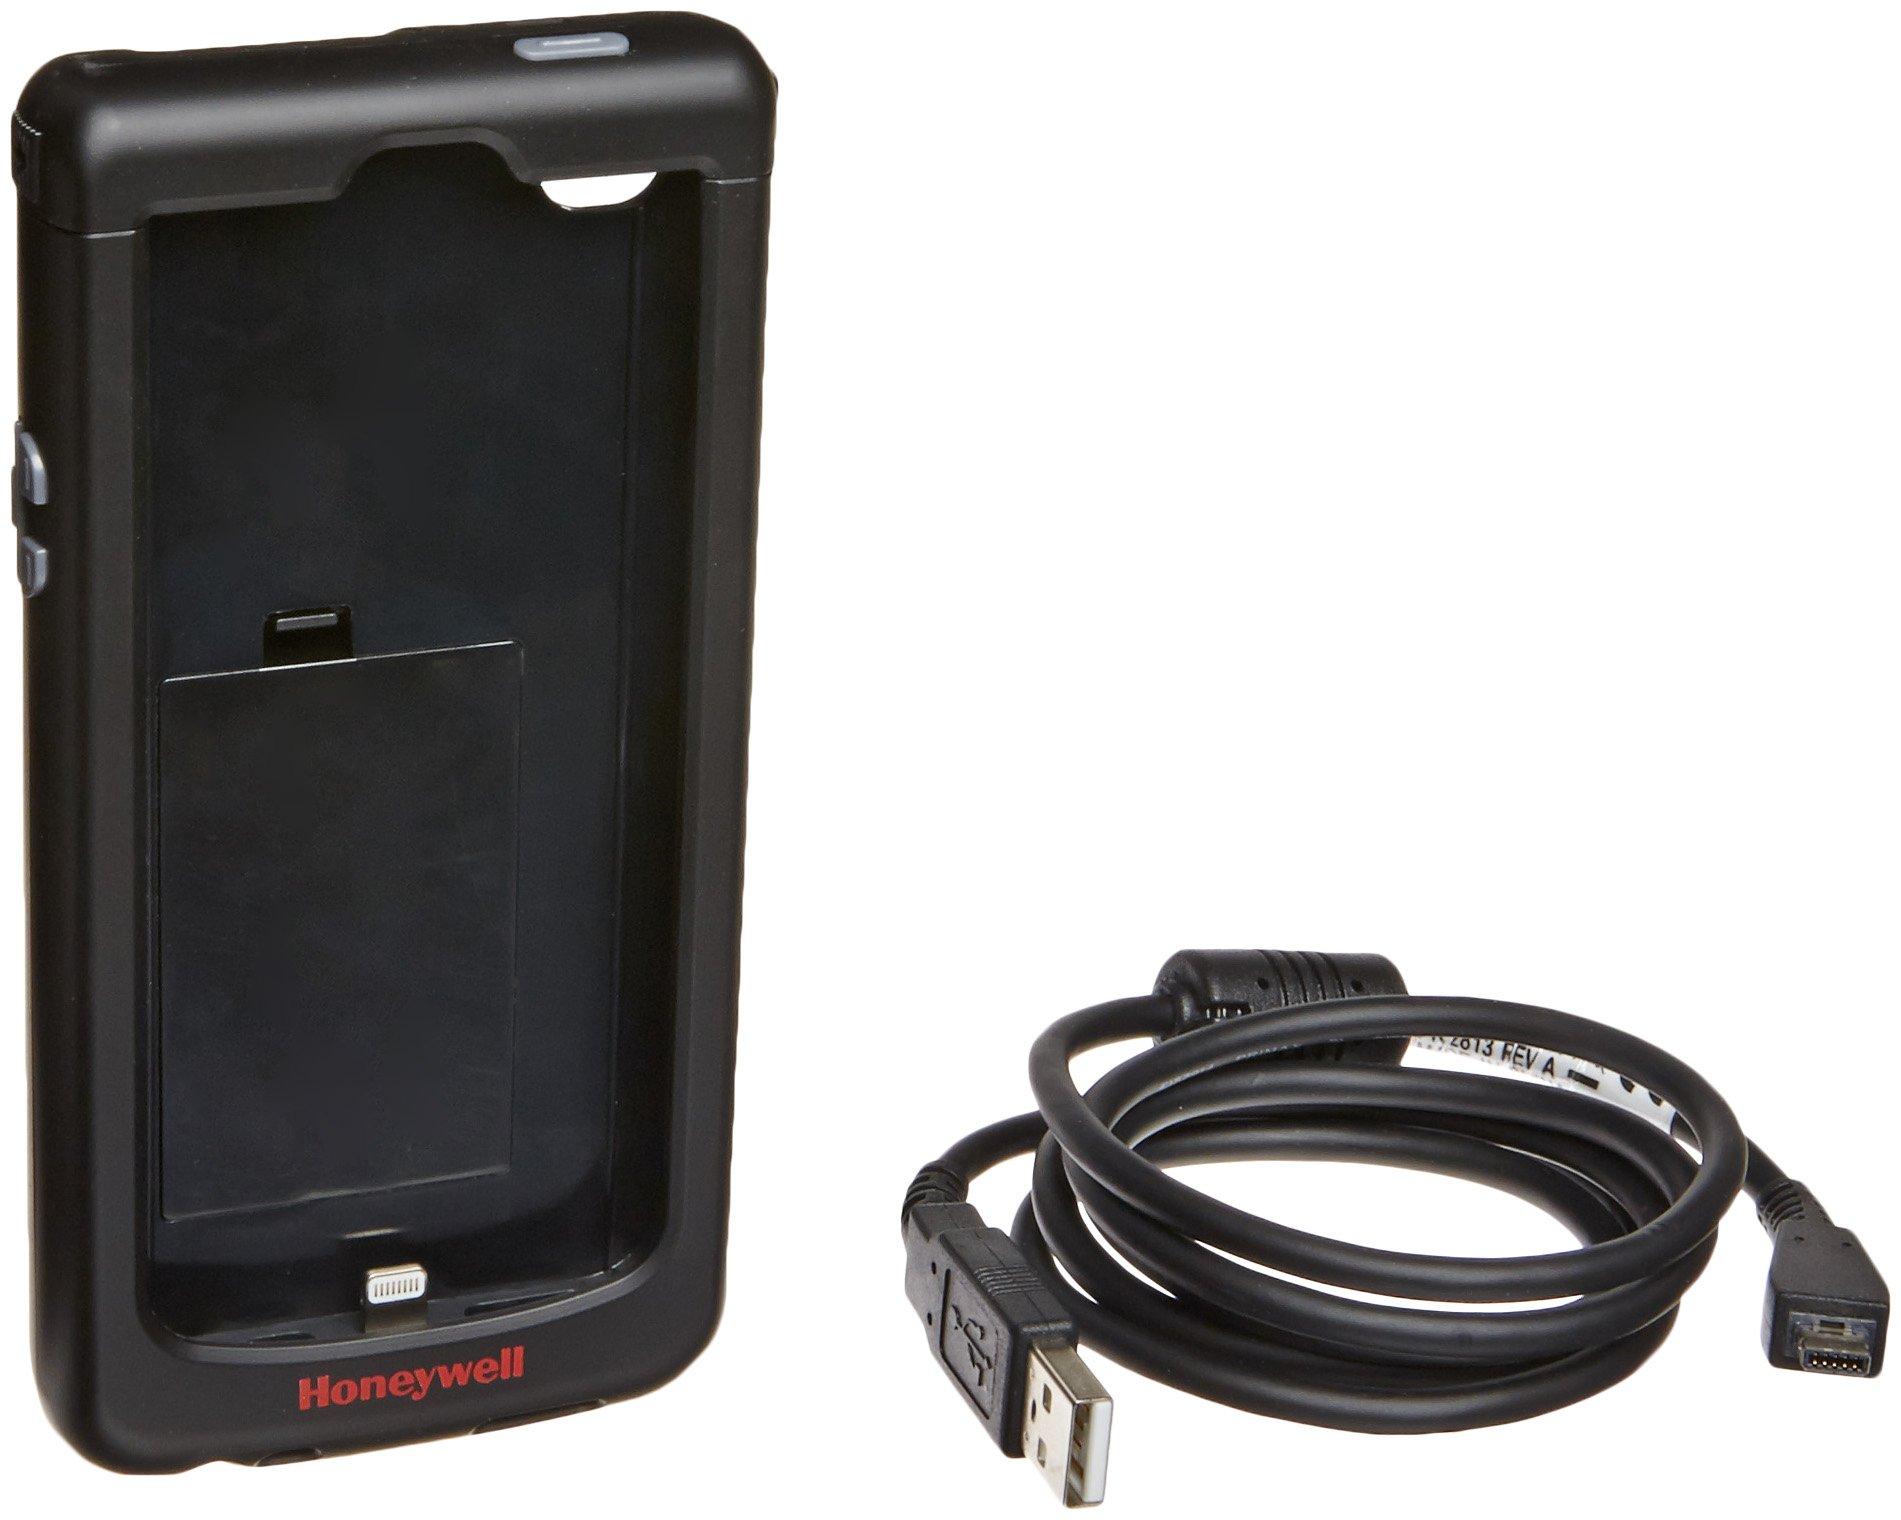 Honeywell Captuvo SL42 for Apple iPhone 5G